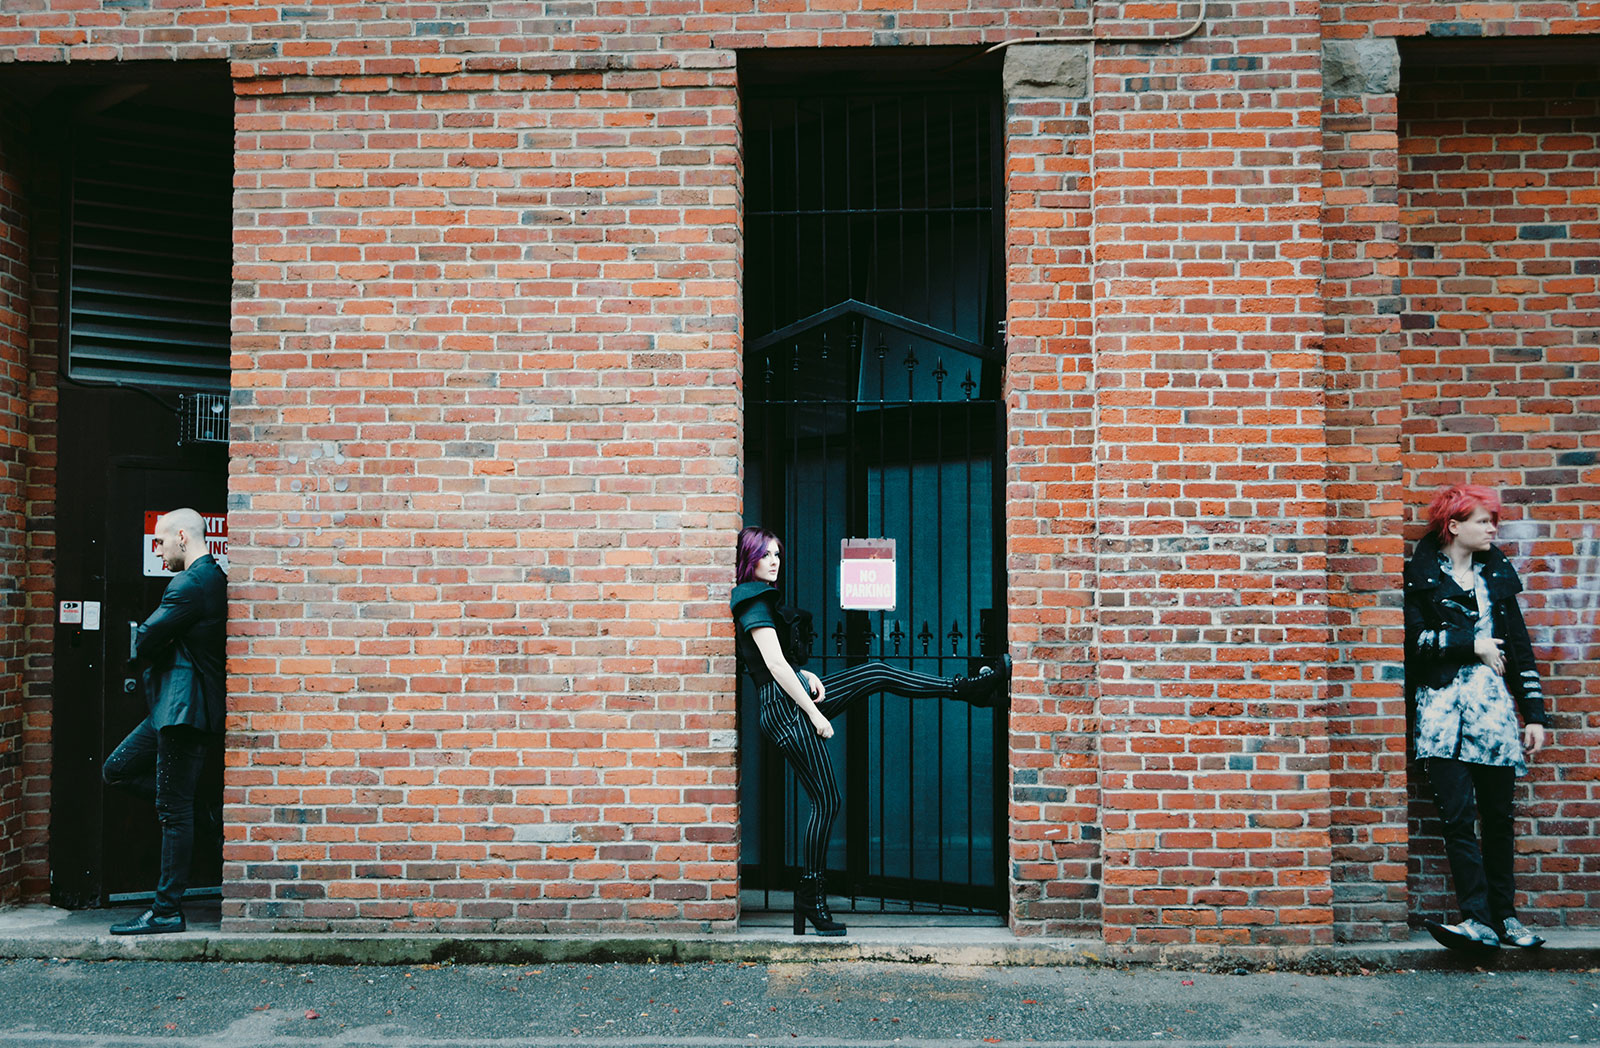 Wade Britz, Bethany Stobbe, and Trevor Stobbe in doorways posing